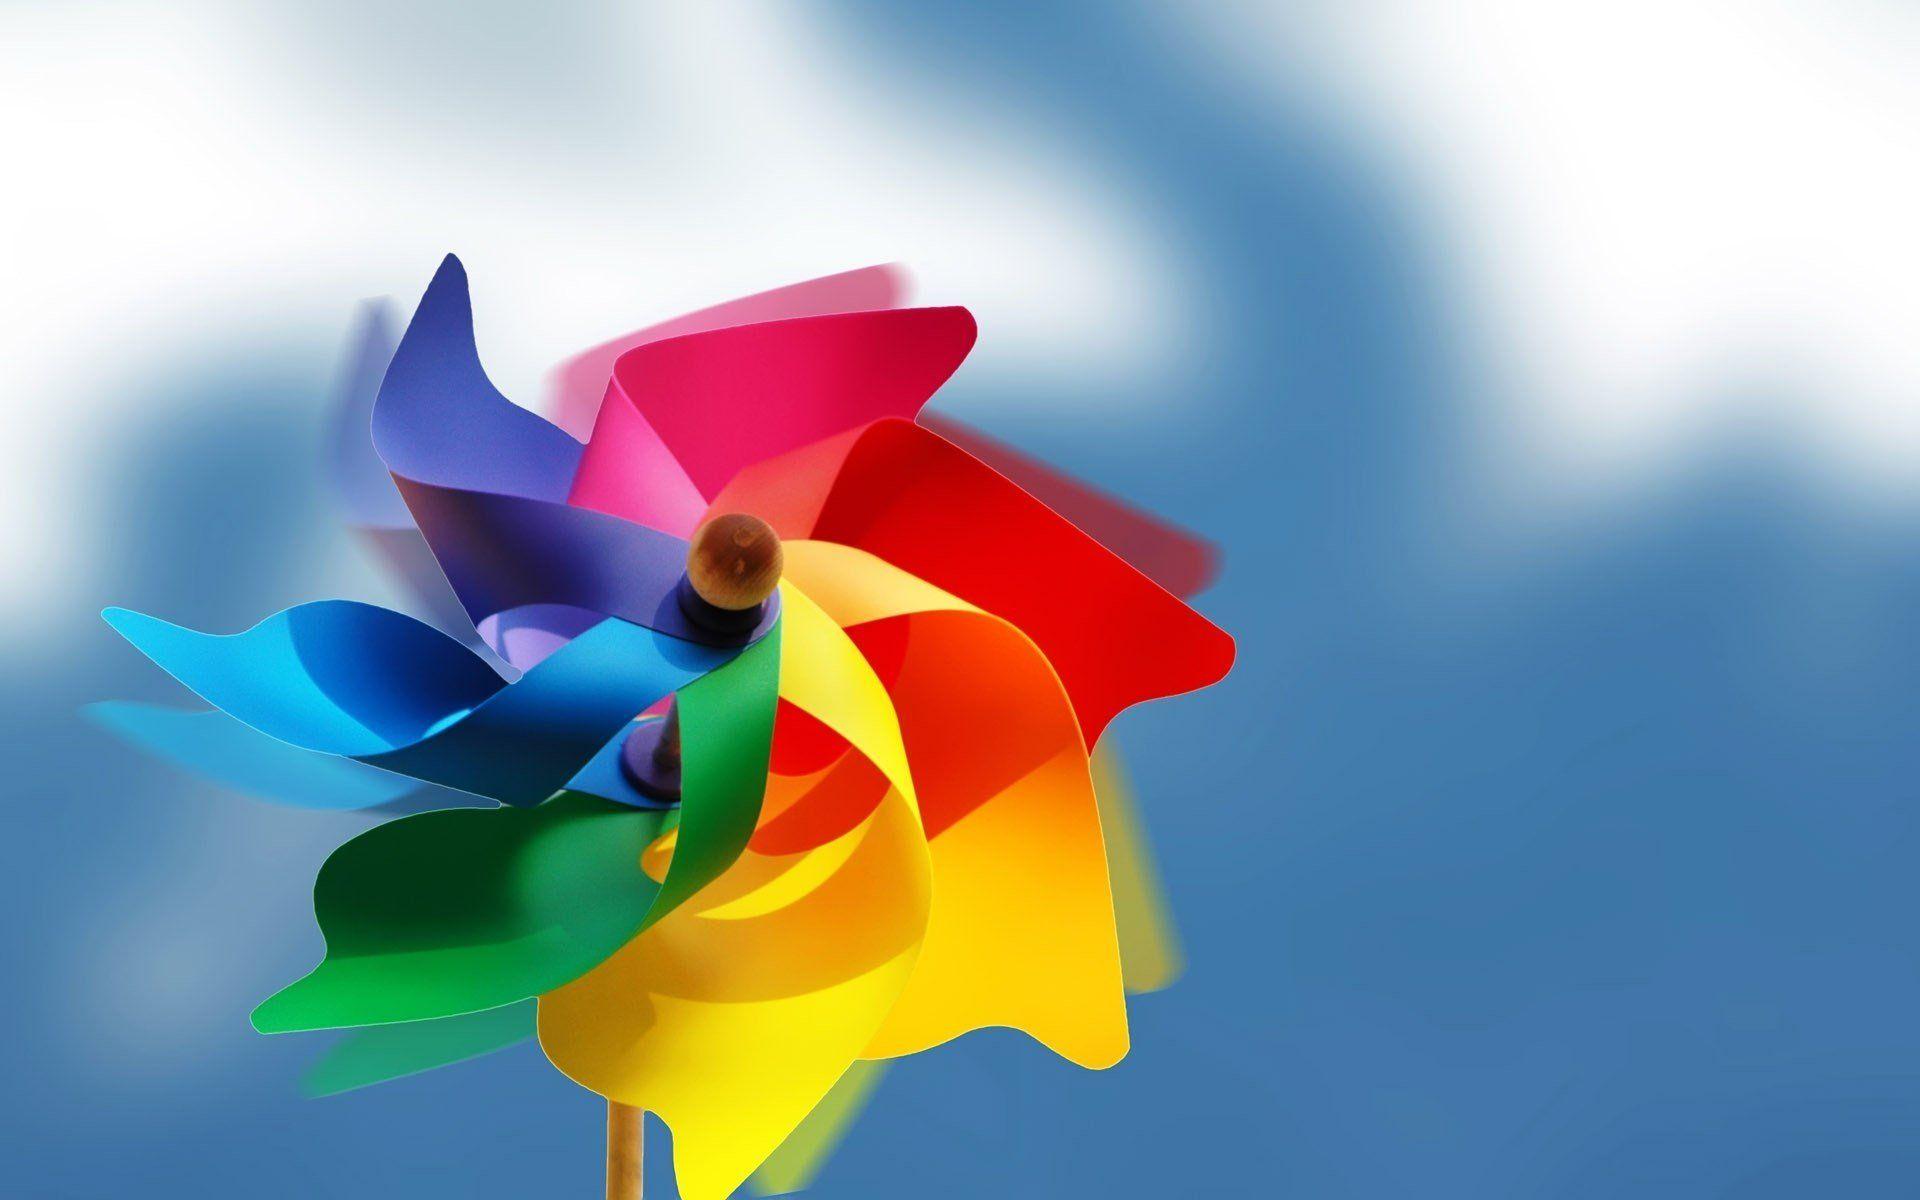 Color Design Art : Rainbow color high design art graphic fantasy digital